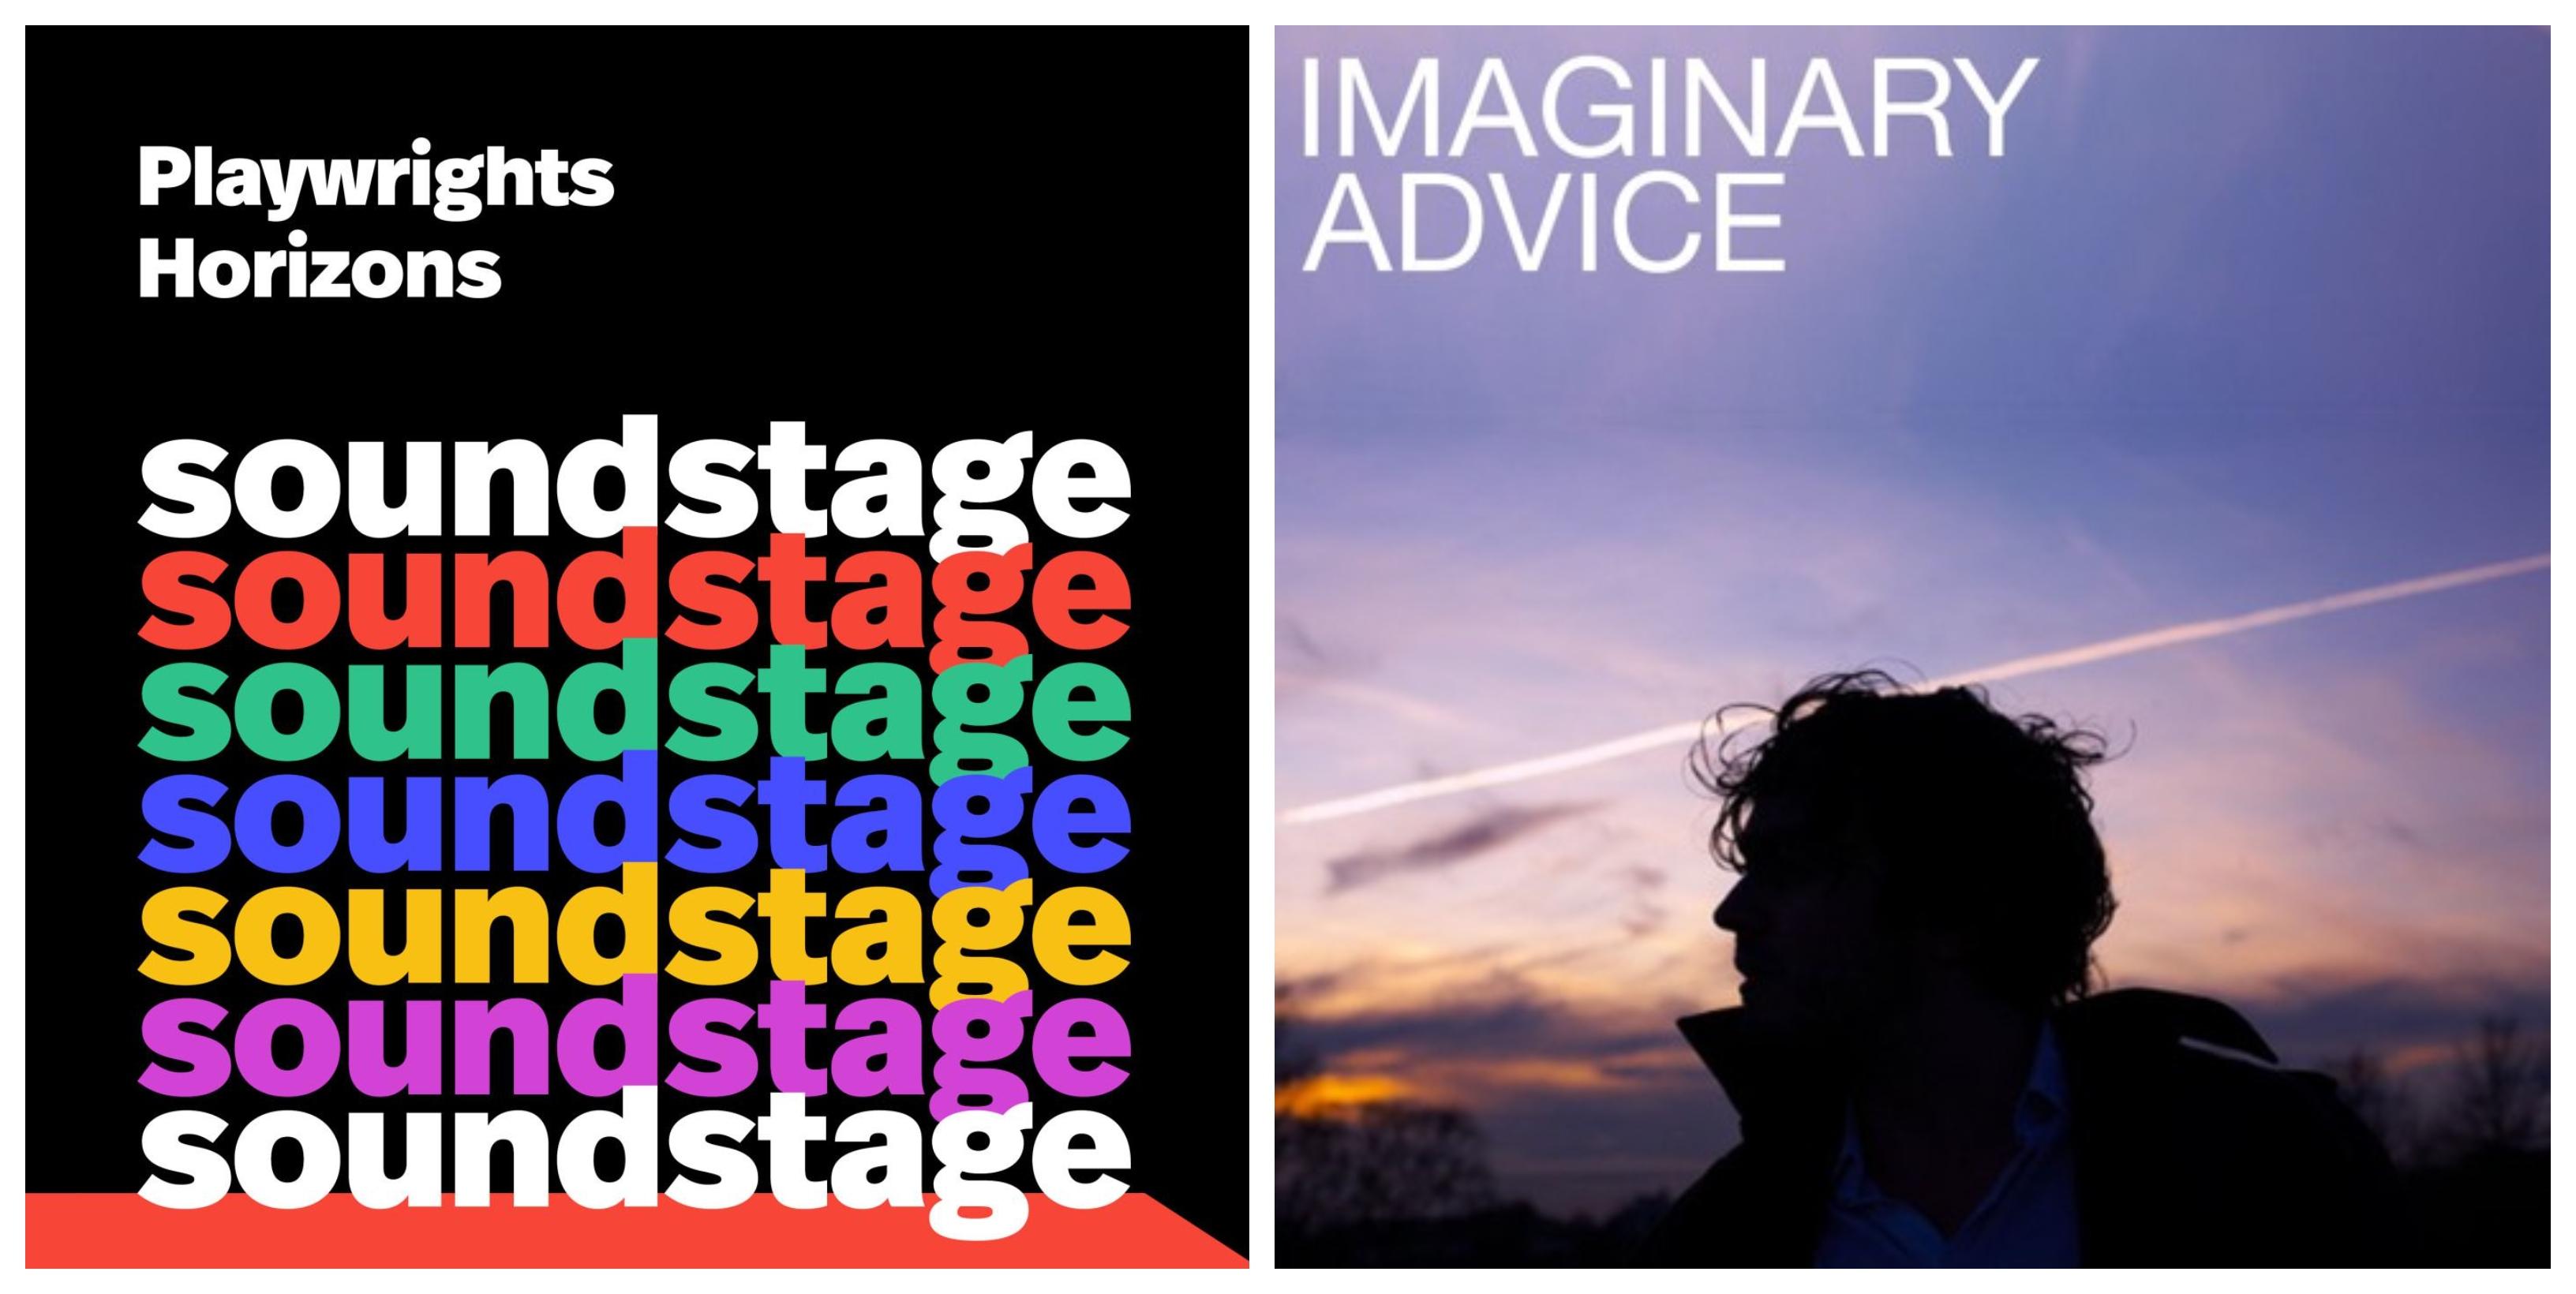 Soundstage - Imaginary Advice